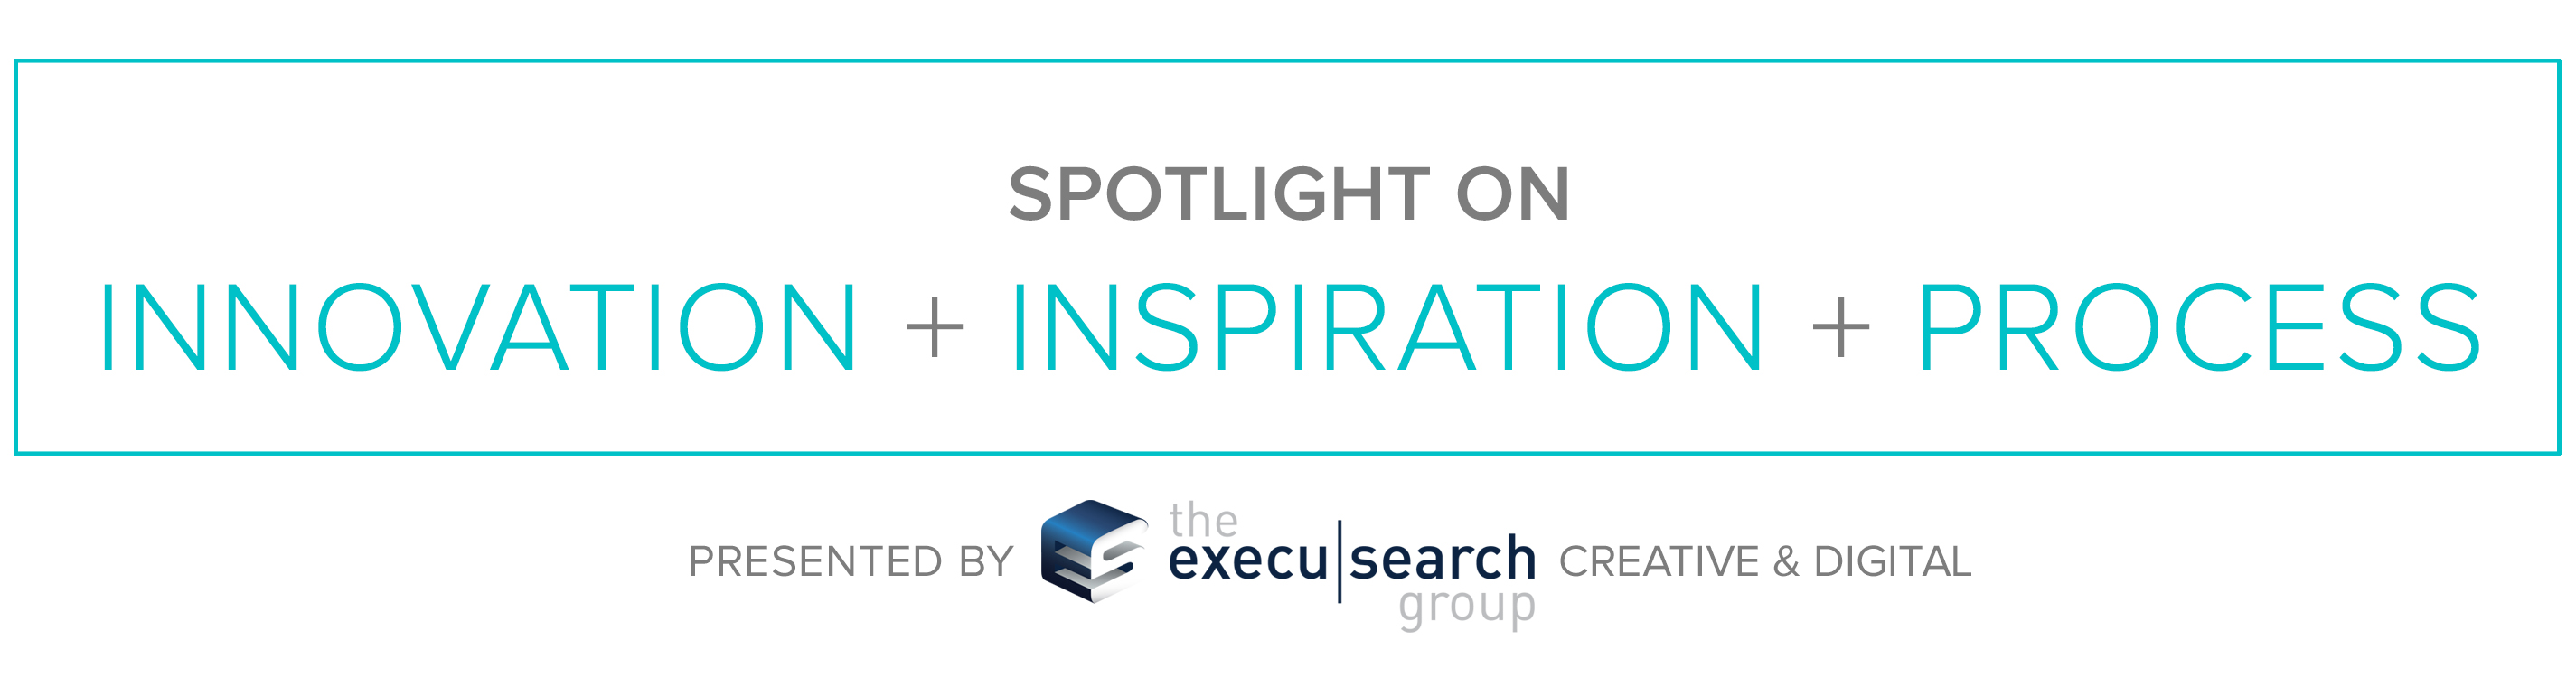 Spotlight Intro Title